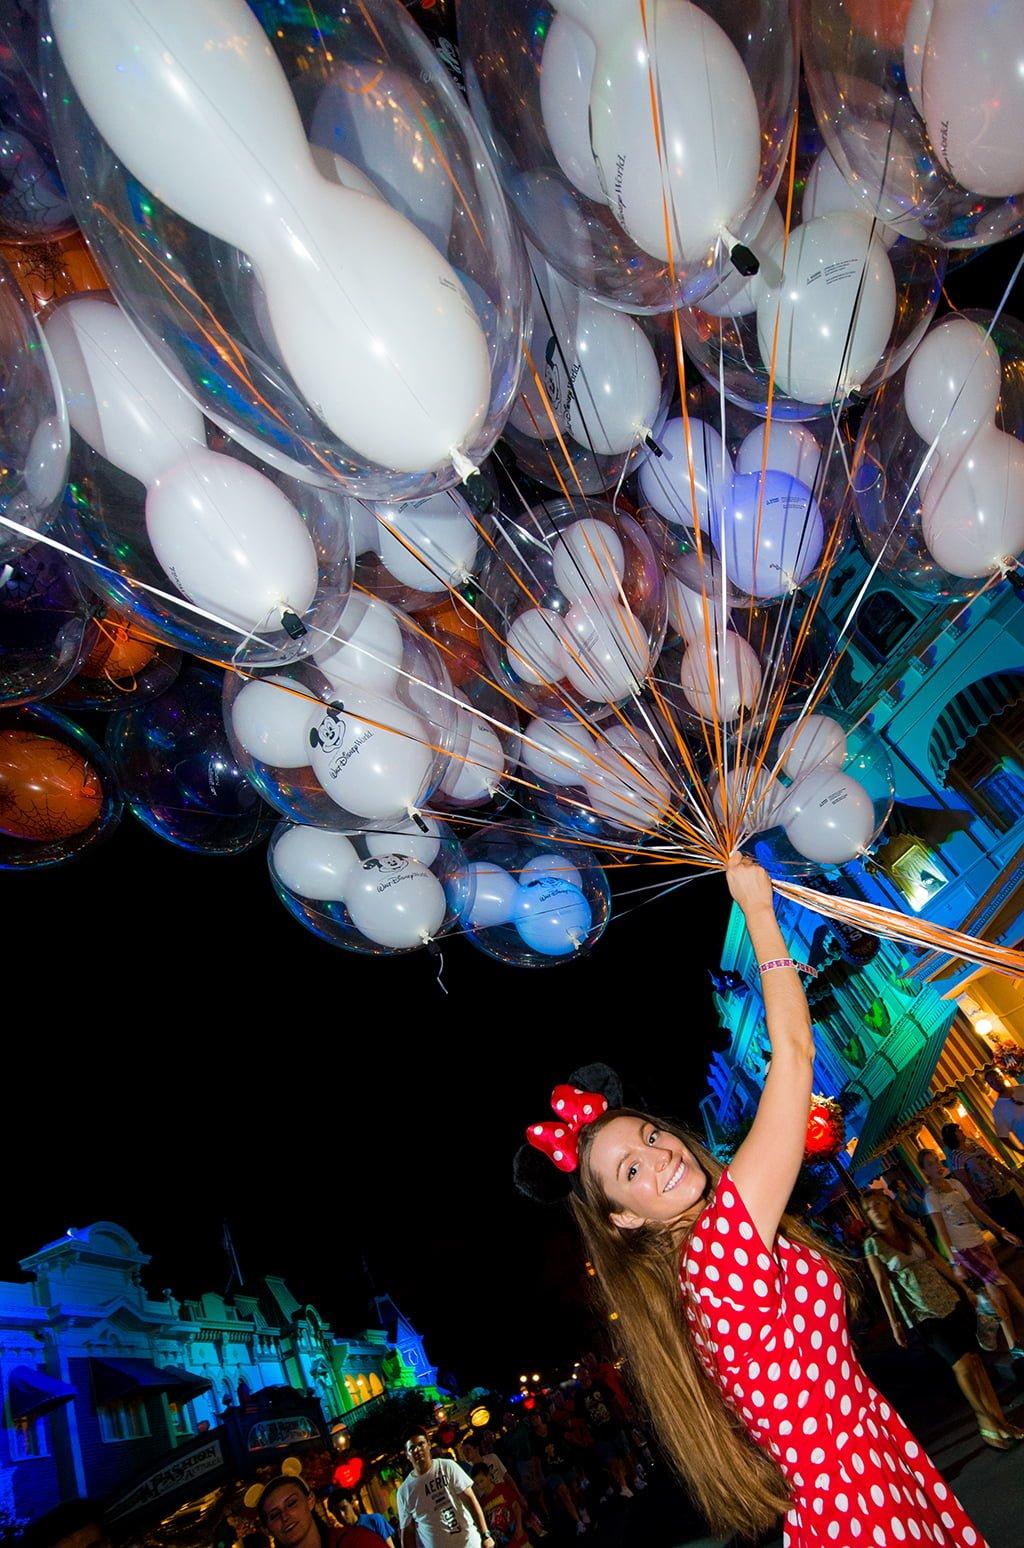 Disney Halloween Party Costume Ideas For Adults.Disney Halloween Costume Ideas Tips Disney Tourist Blog